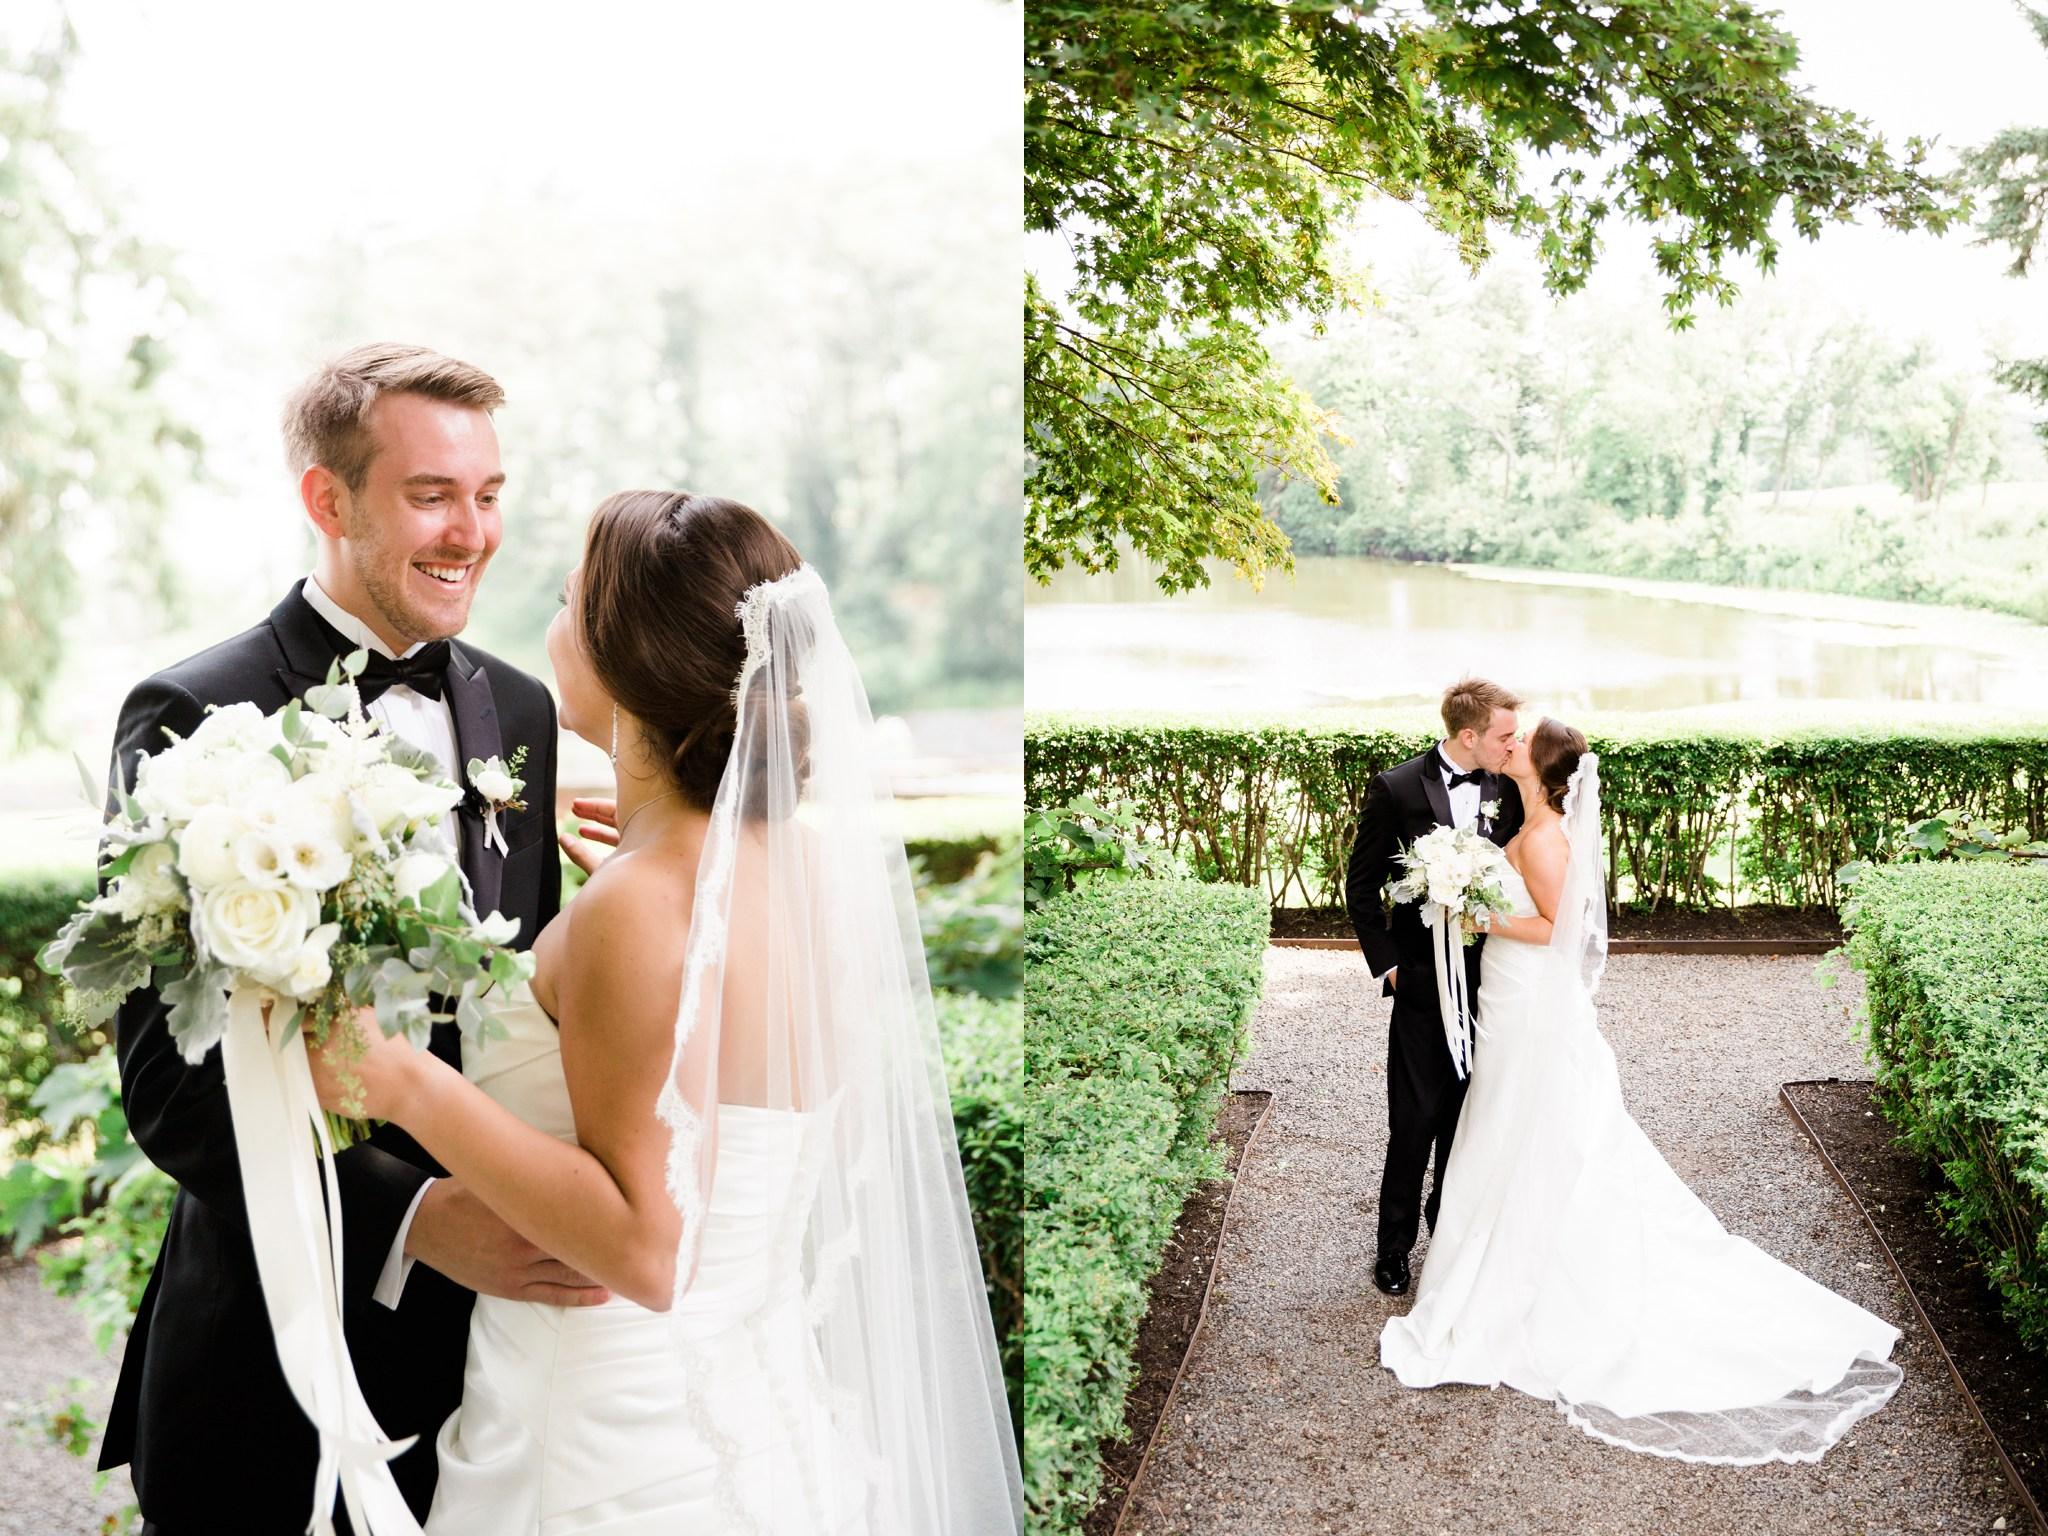 turner_hill_wedding_photos_00016.JPG